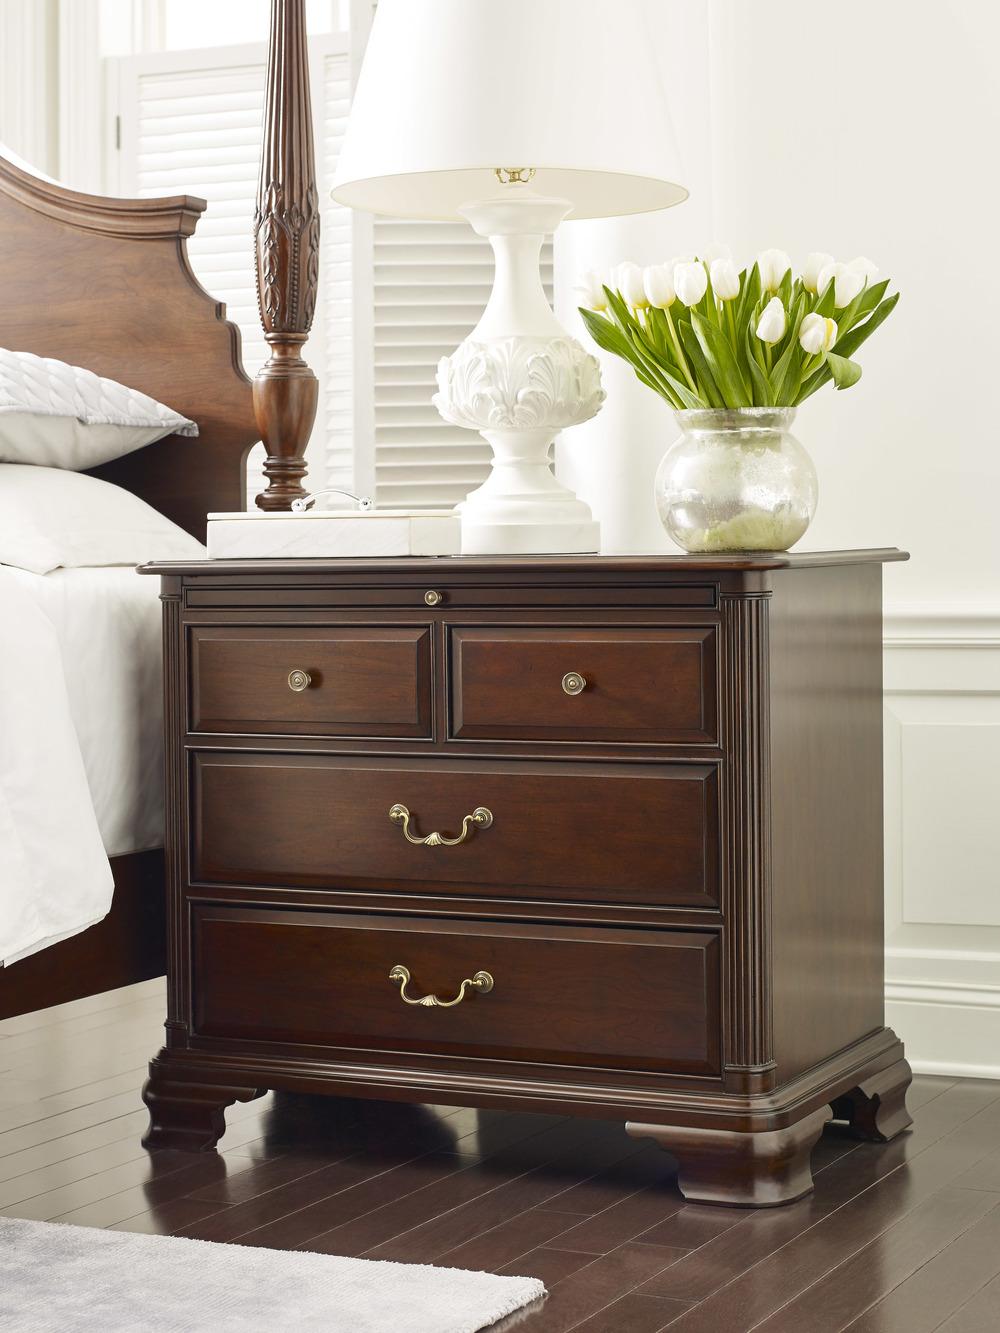 Kincaid Furniture - Bachelor's Chest